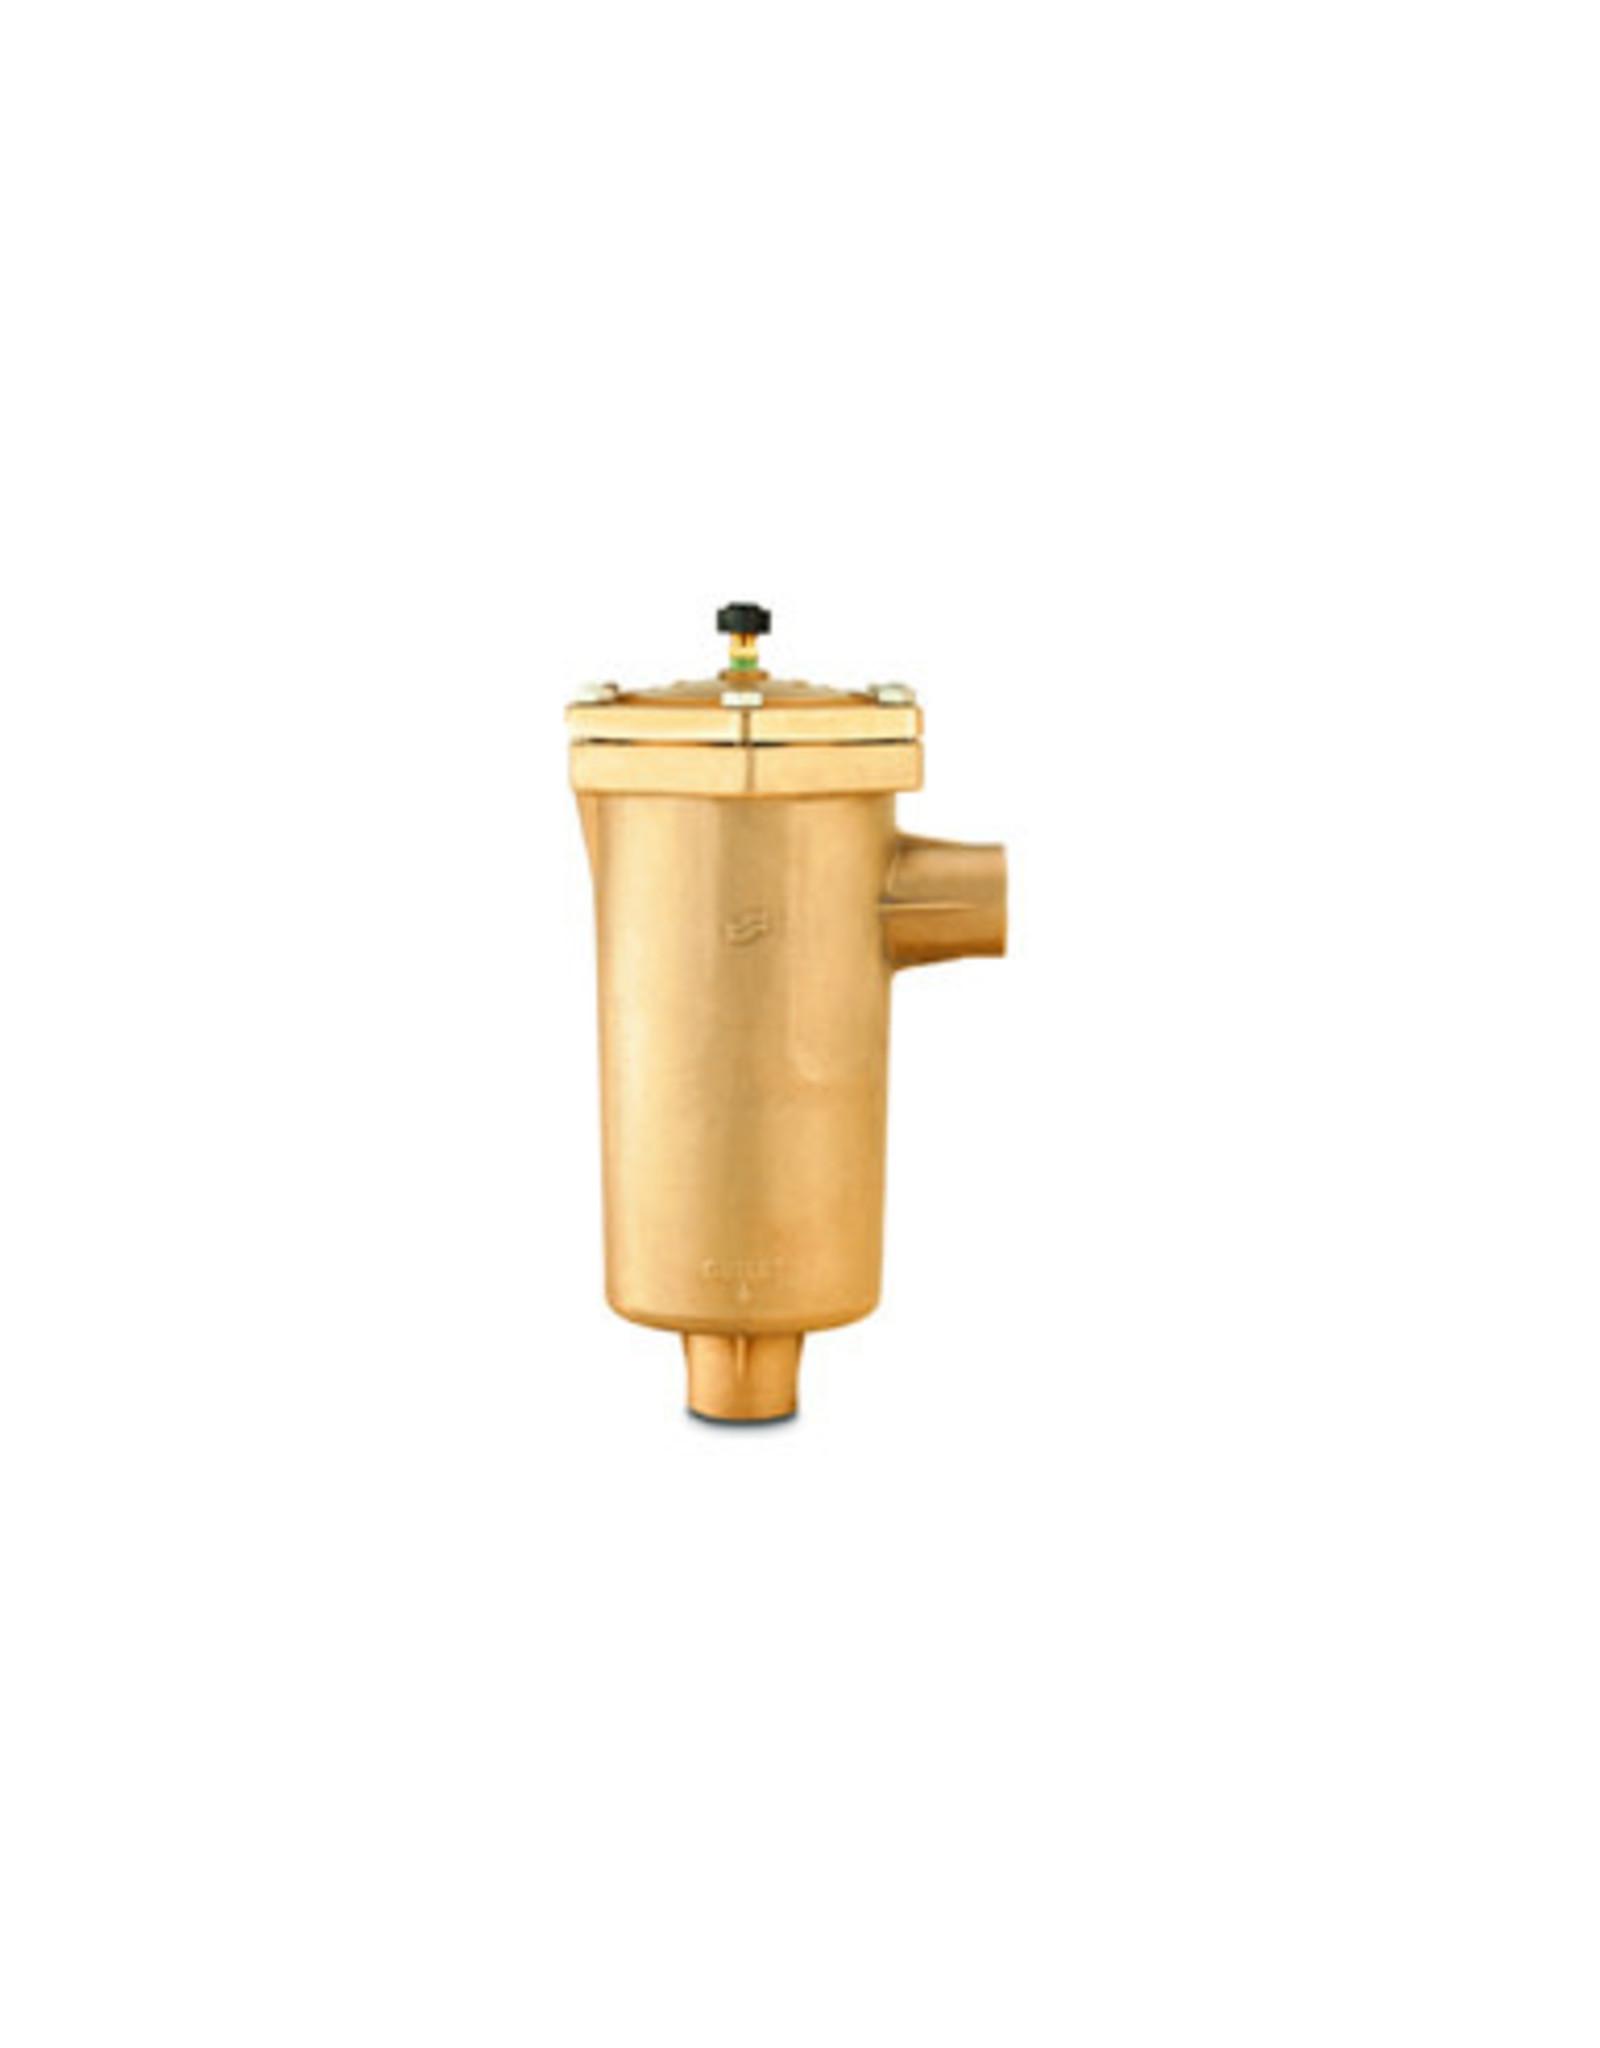 Superior HVACR 3CFA Angle Brass Shells